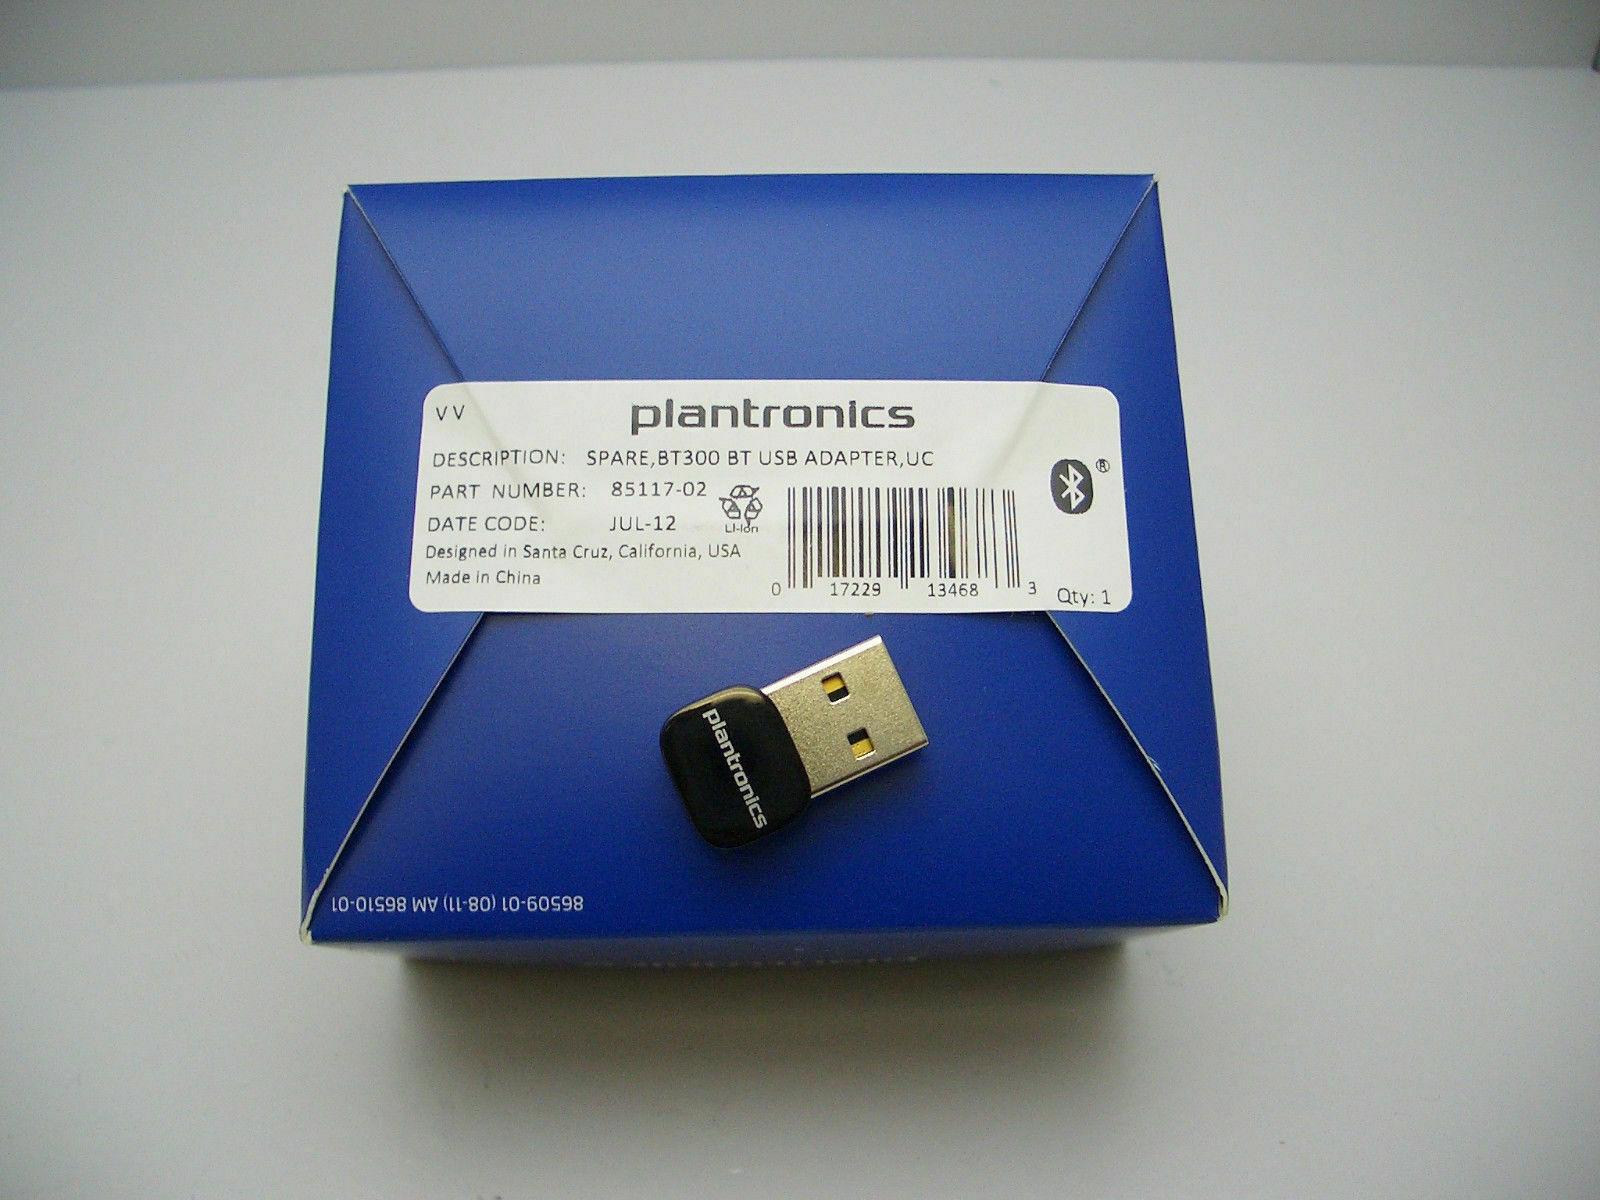 Plantronics BT300 Bluetooth 2.0 Adapter 89259-02 for Calisto 620 Legend B235